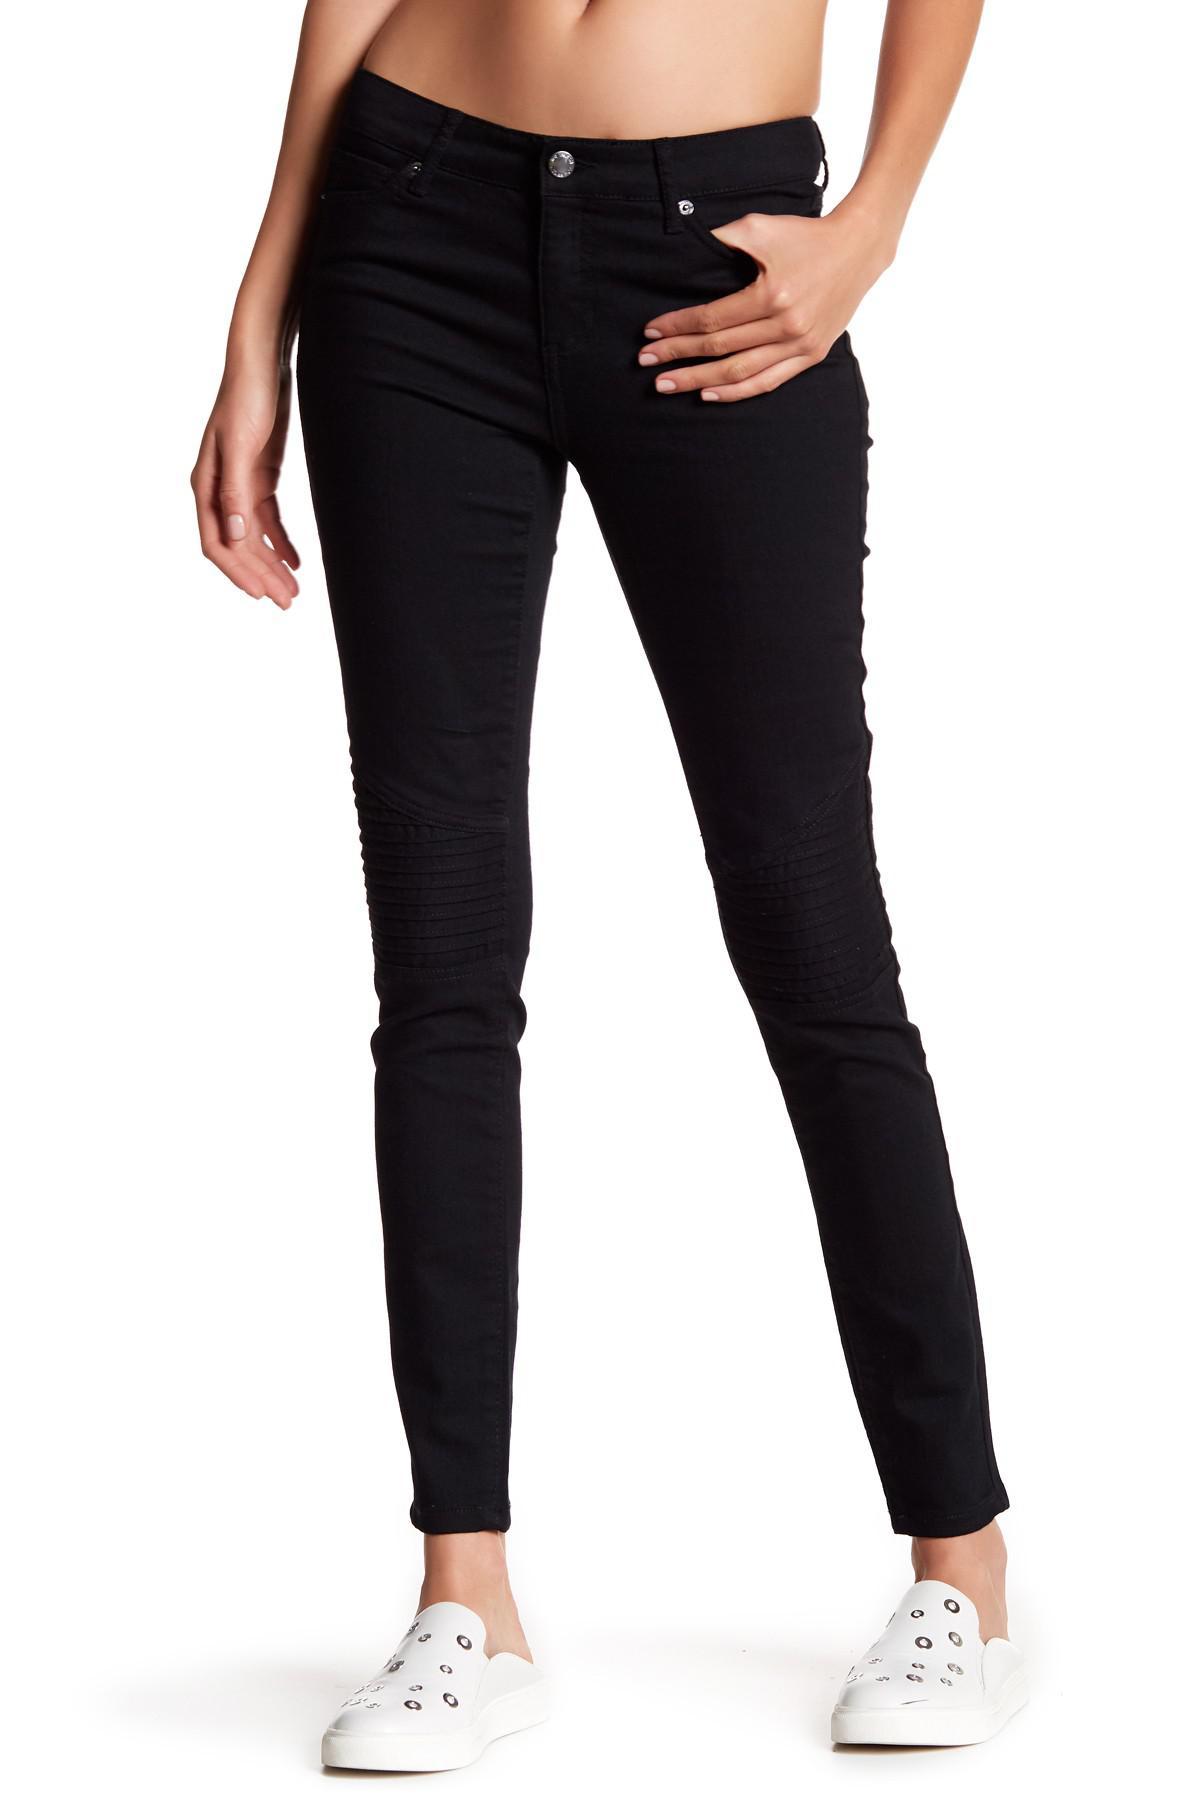 72a6dc03deb0 Lyst - Joe Fresh Twill Moto Skinny Jeans in Black